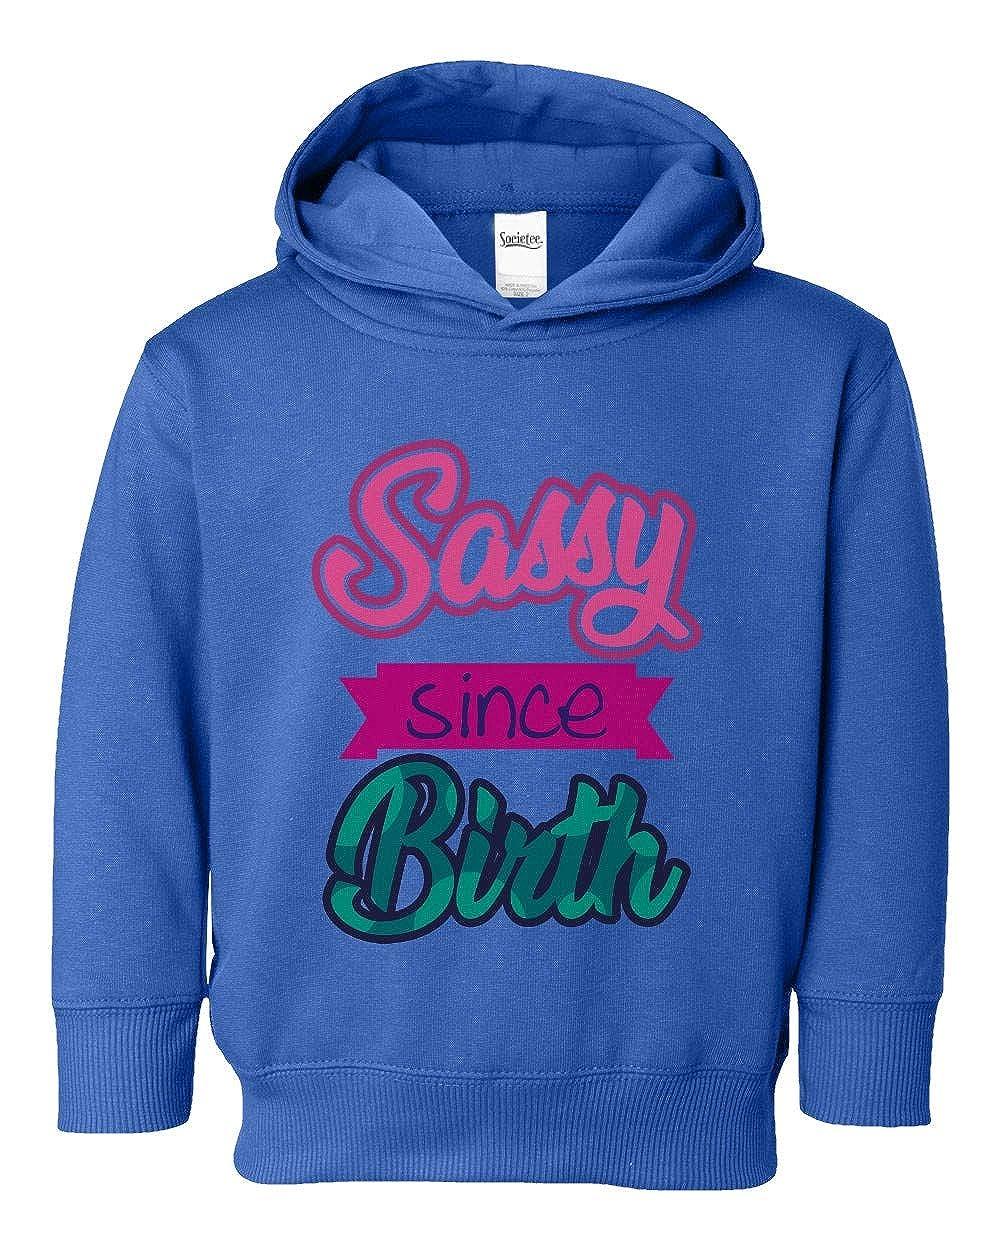 Societee Girls Sassy Since Birth Graphic Girls Boys Toddler Hooded Sweatshirt